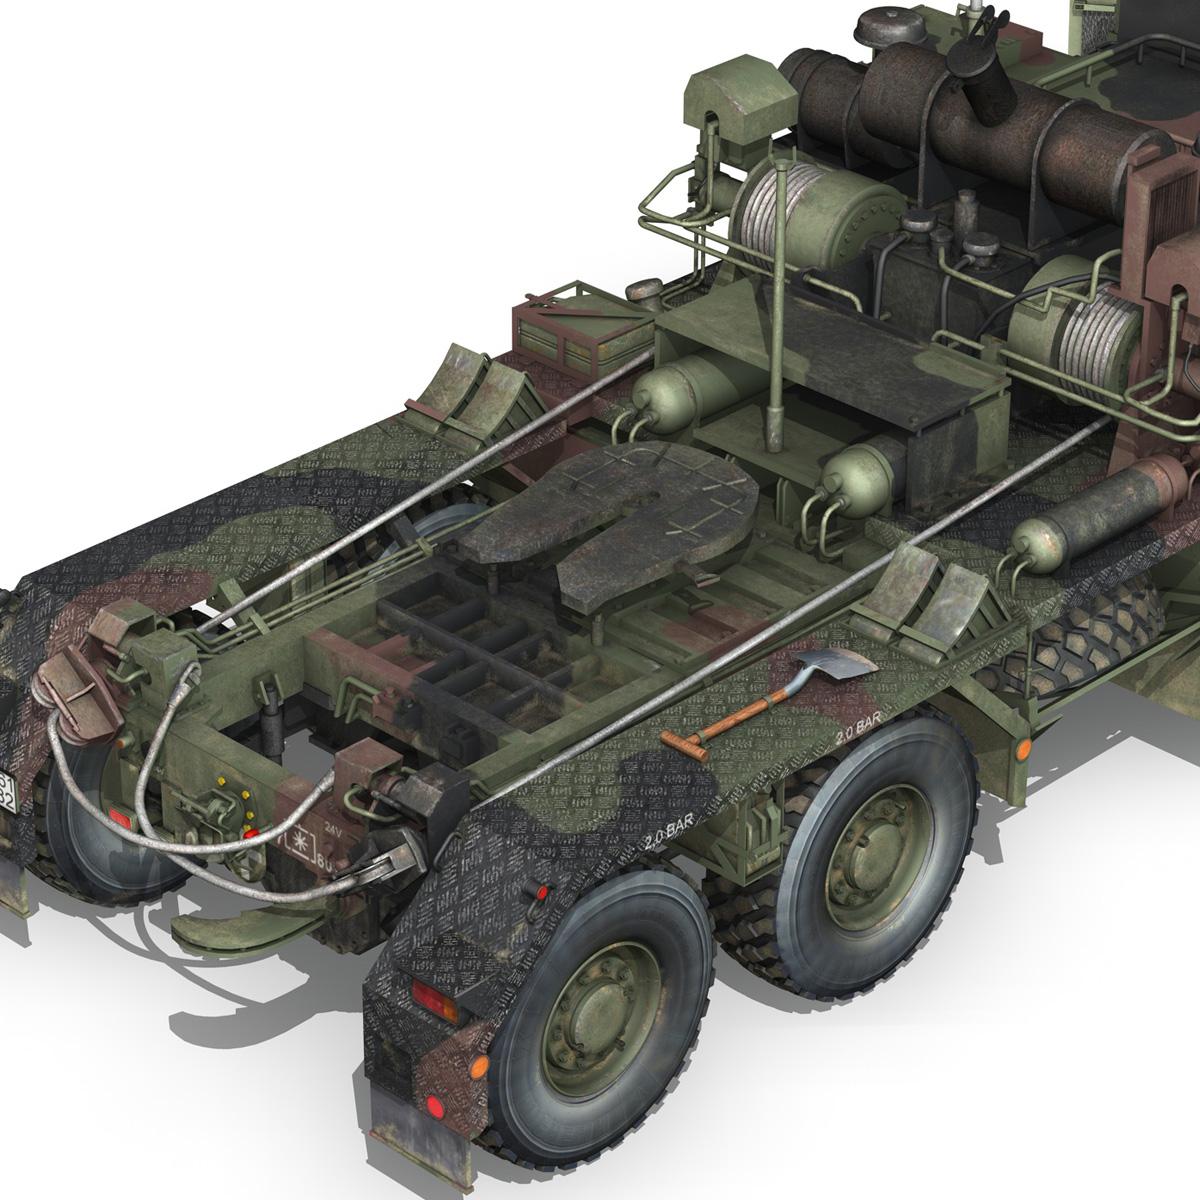 faun stl-56 transportues tank 3d model 3ds fbx c4d lwo obj 201919